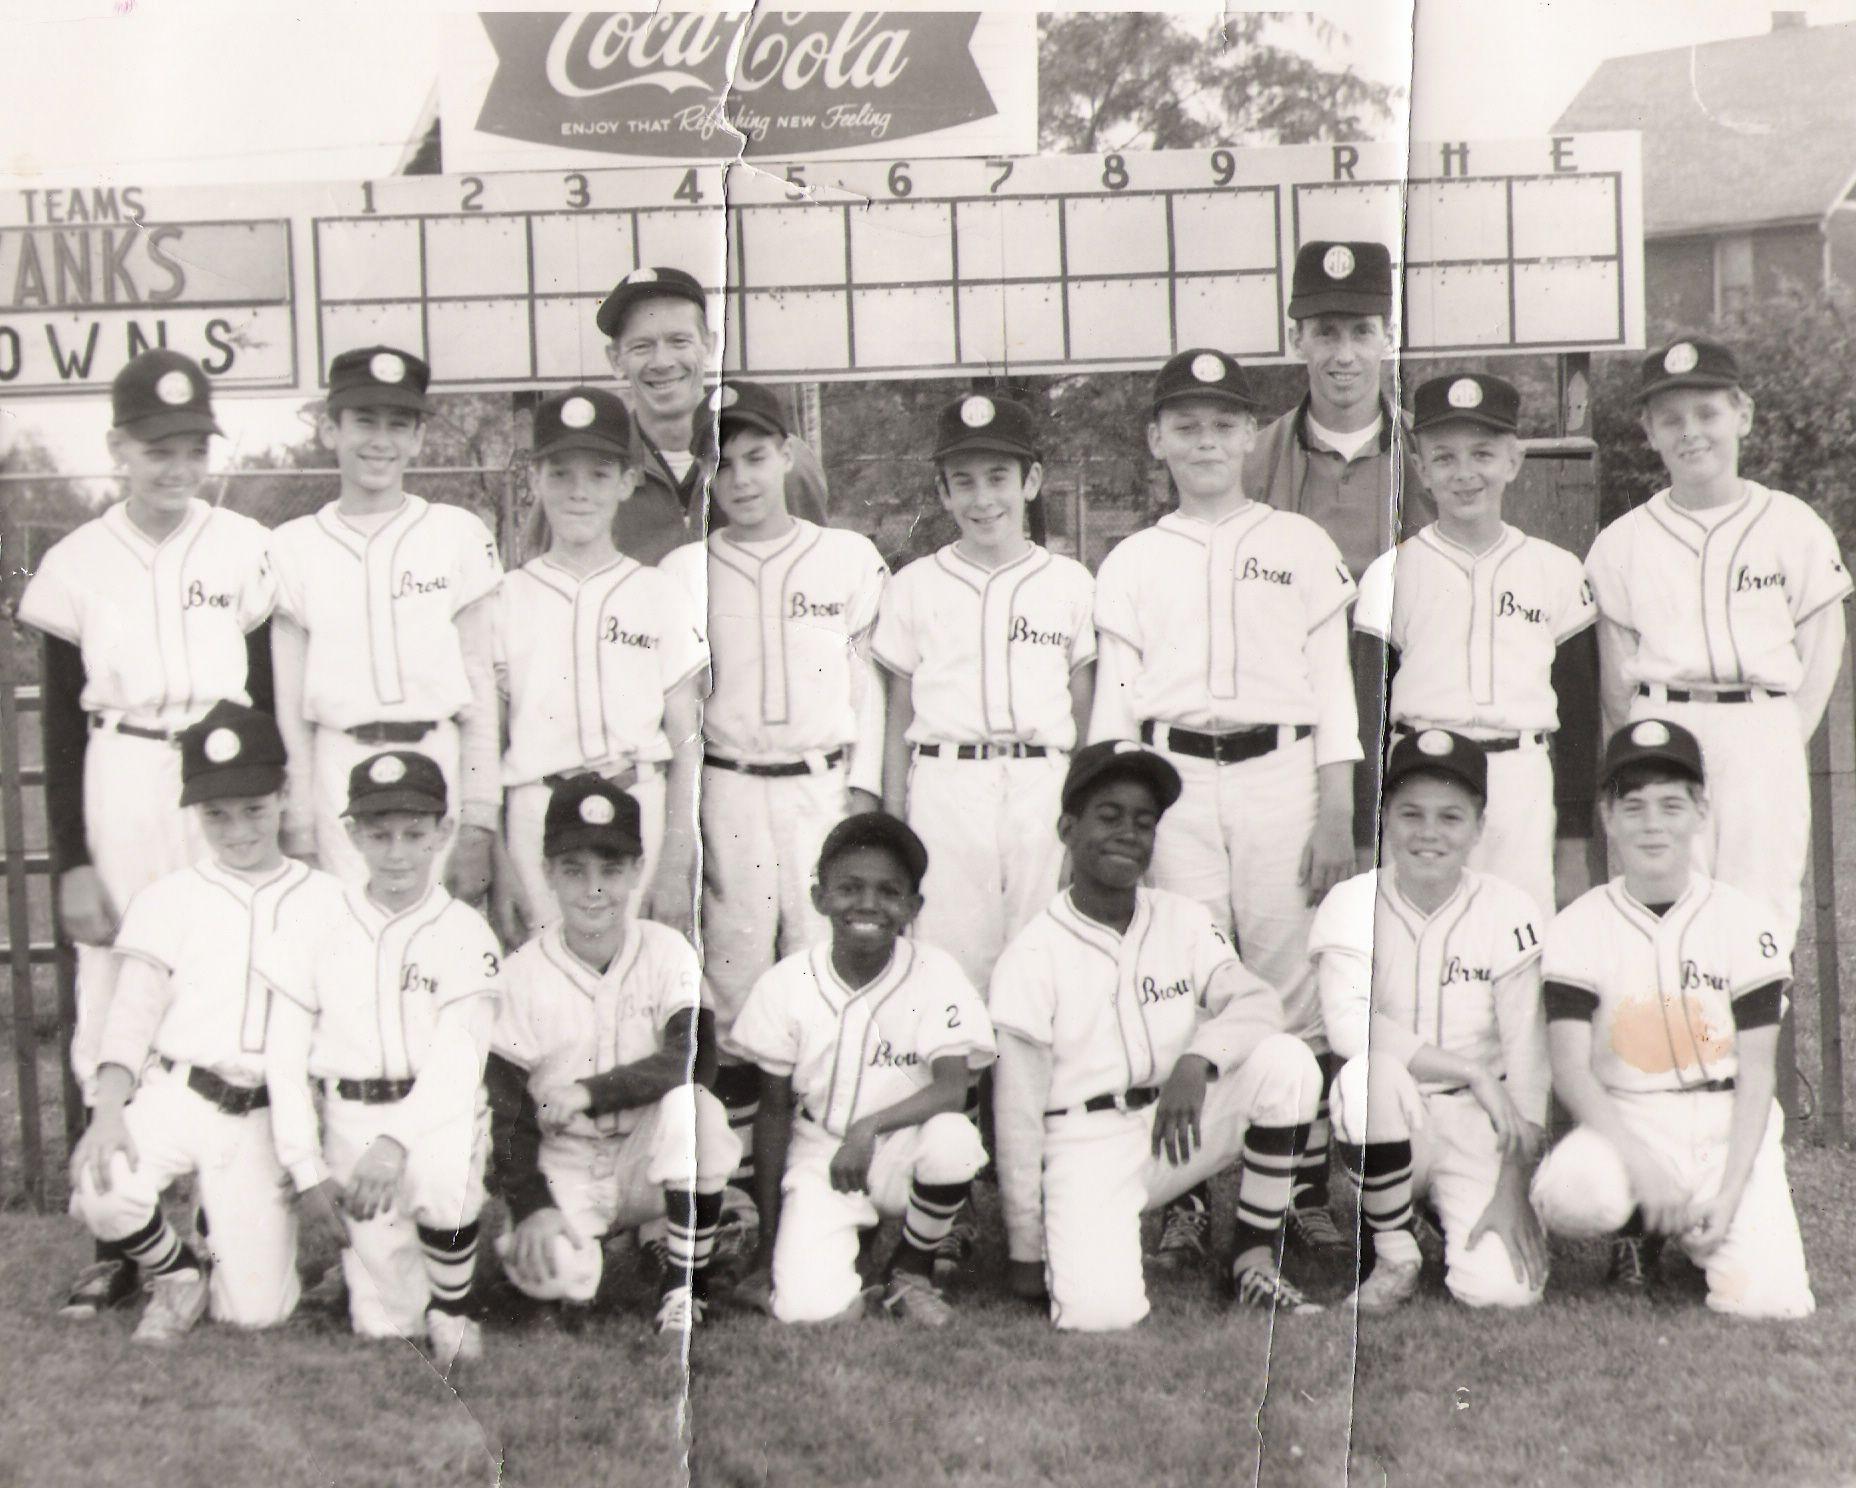 1960 S Mighty Mite Baseball In Ne Canton Ohio Canton Ohio Canton Ohio